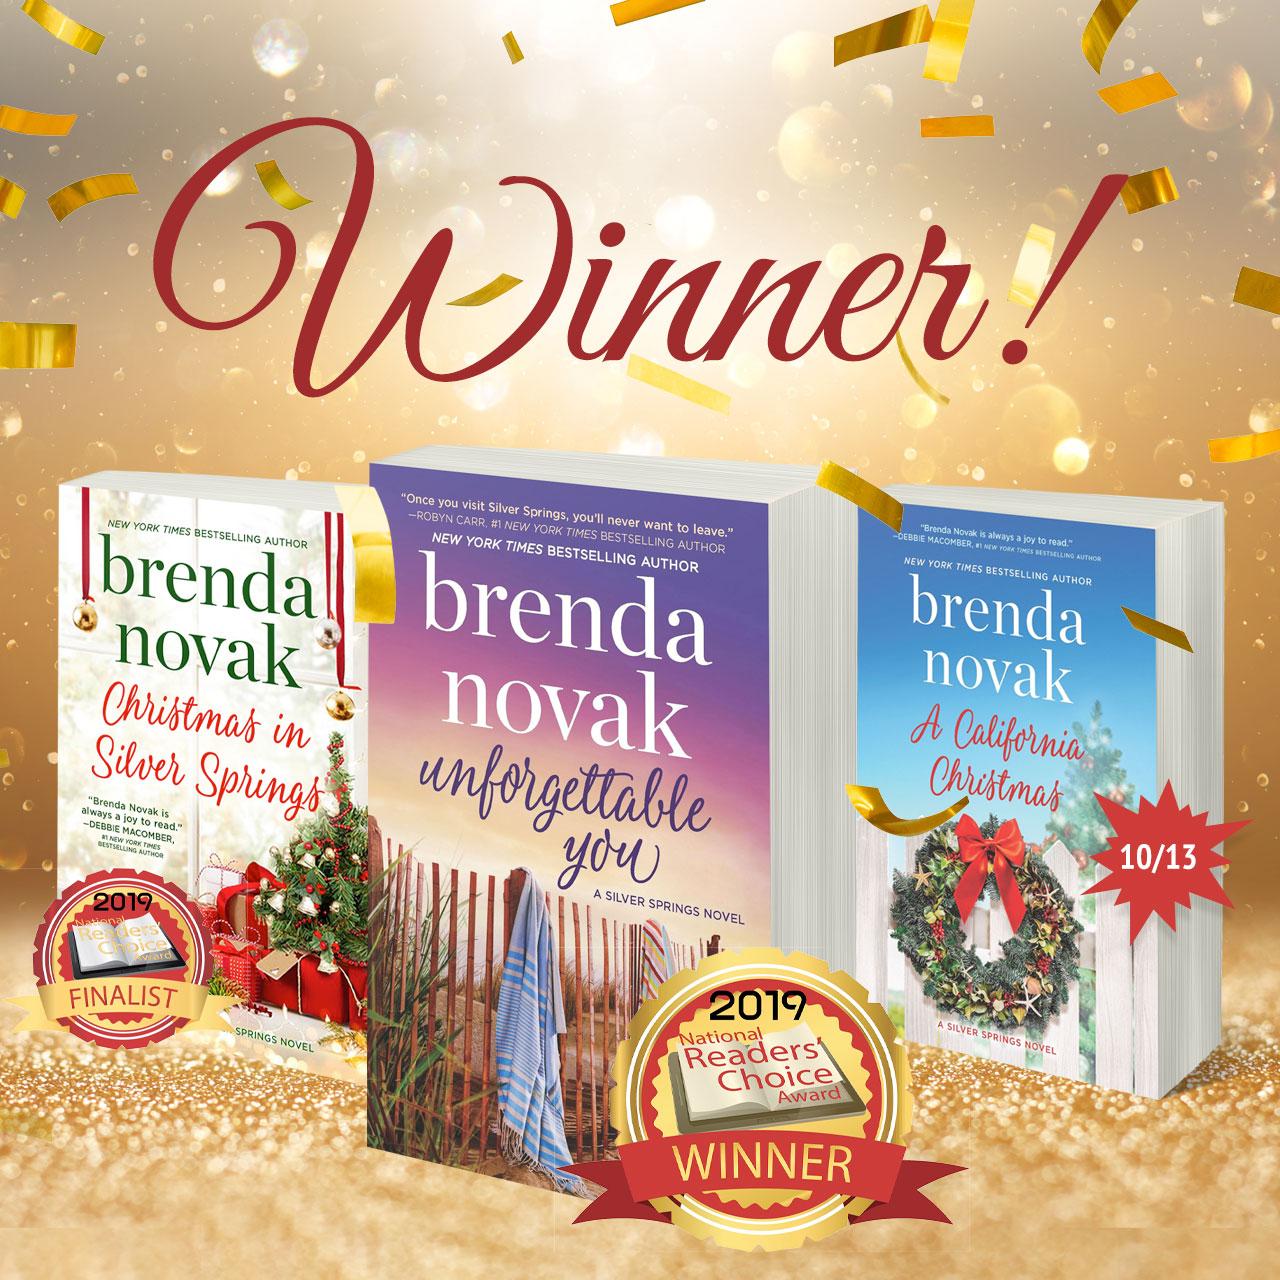 National Readers' Choice Award Winner!